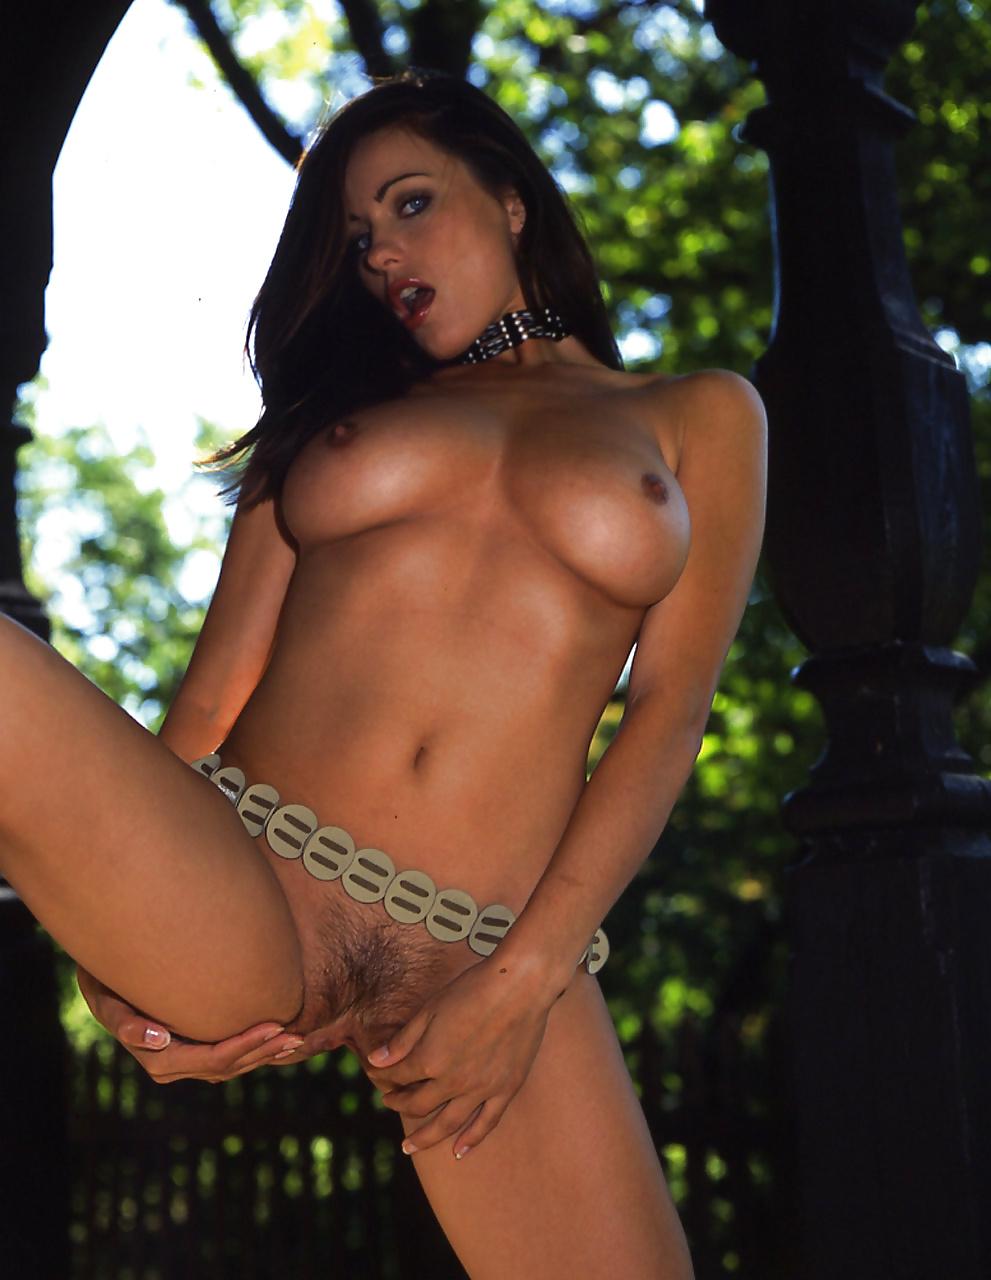 Kyla doyle naked pics